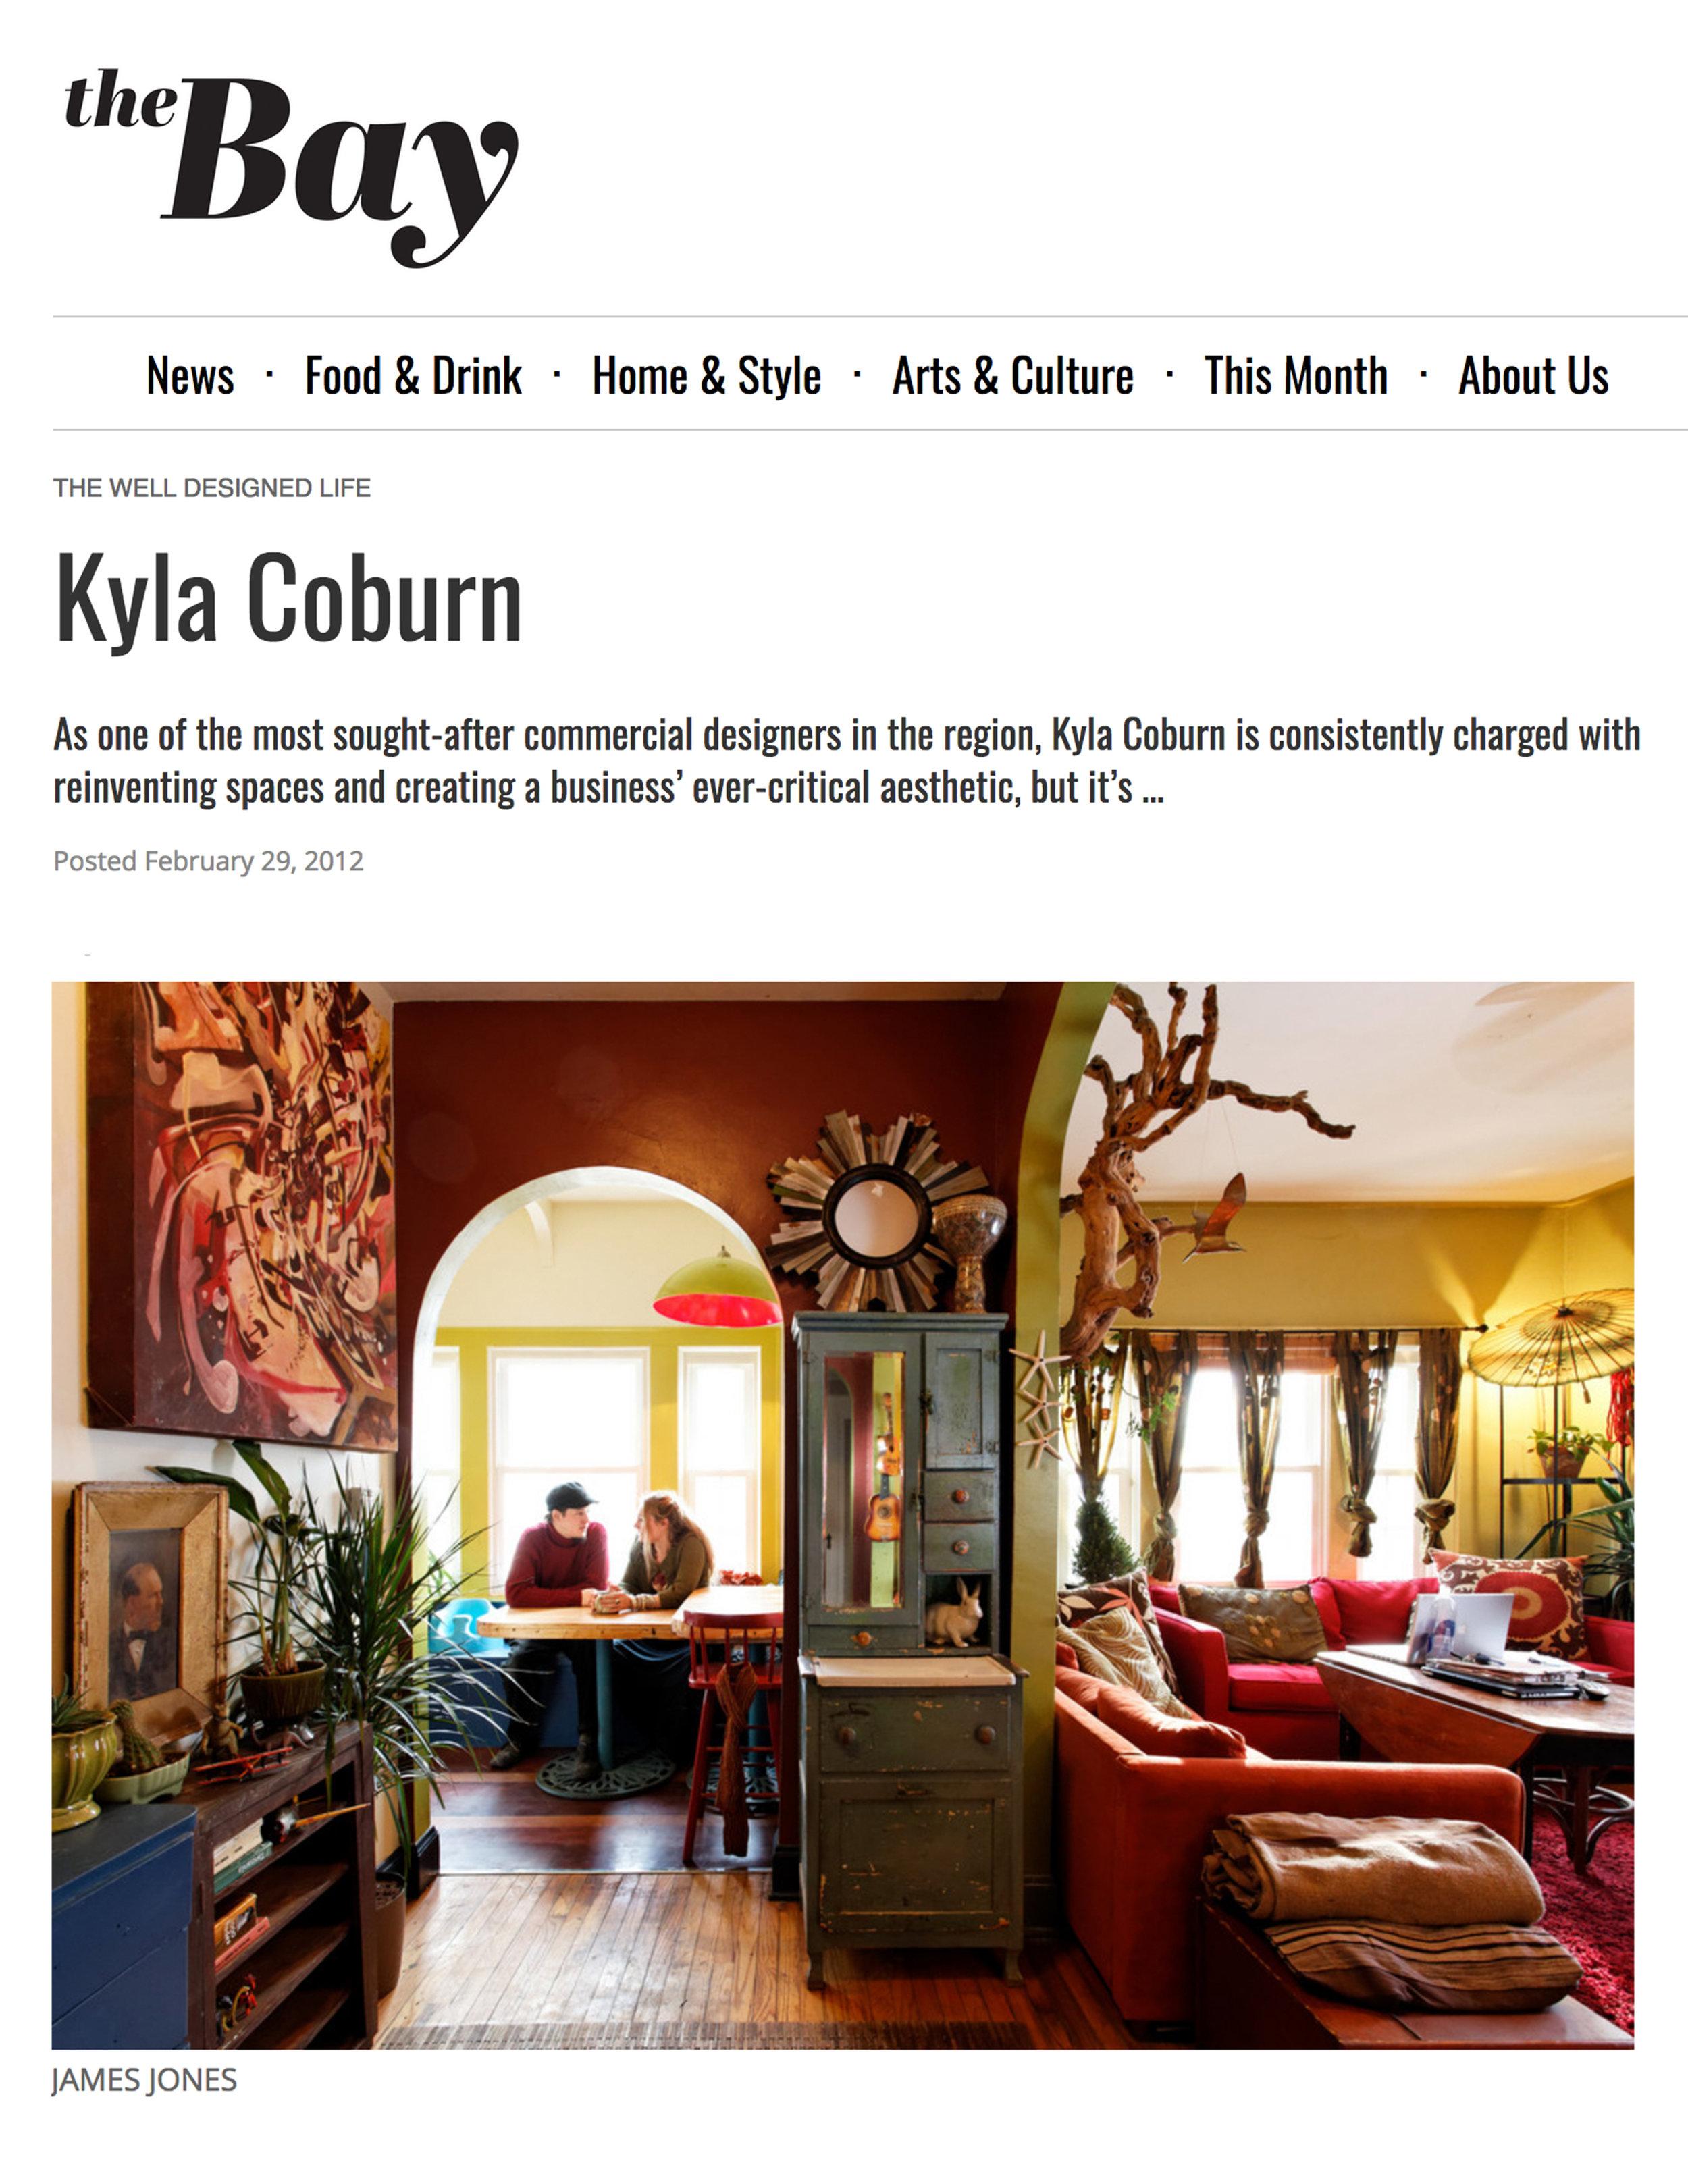 KylaCoburnInteriorDesignTheBayMagazine.jpg